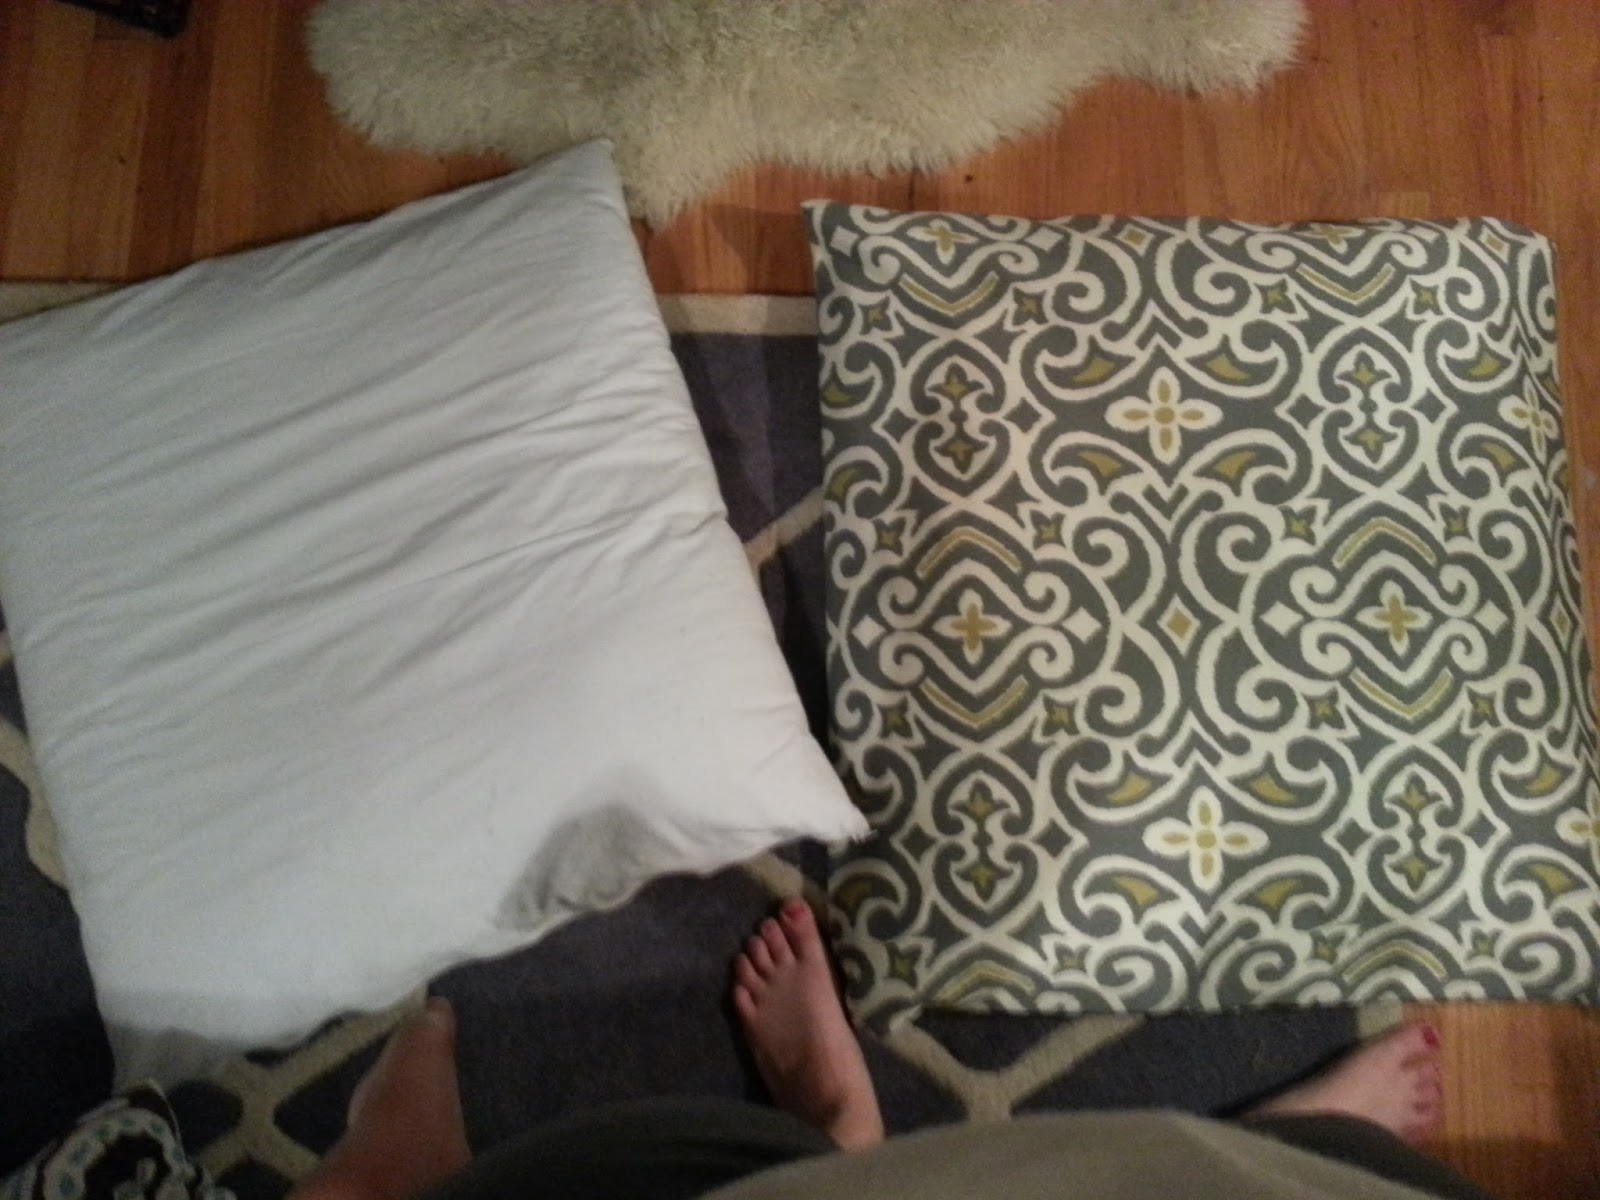 DIY: No-Sew Dog Pillow Covers & Erie-sisti-Bull: DIY: No-Sew Dog Pillow Covers pillowsntoast.com